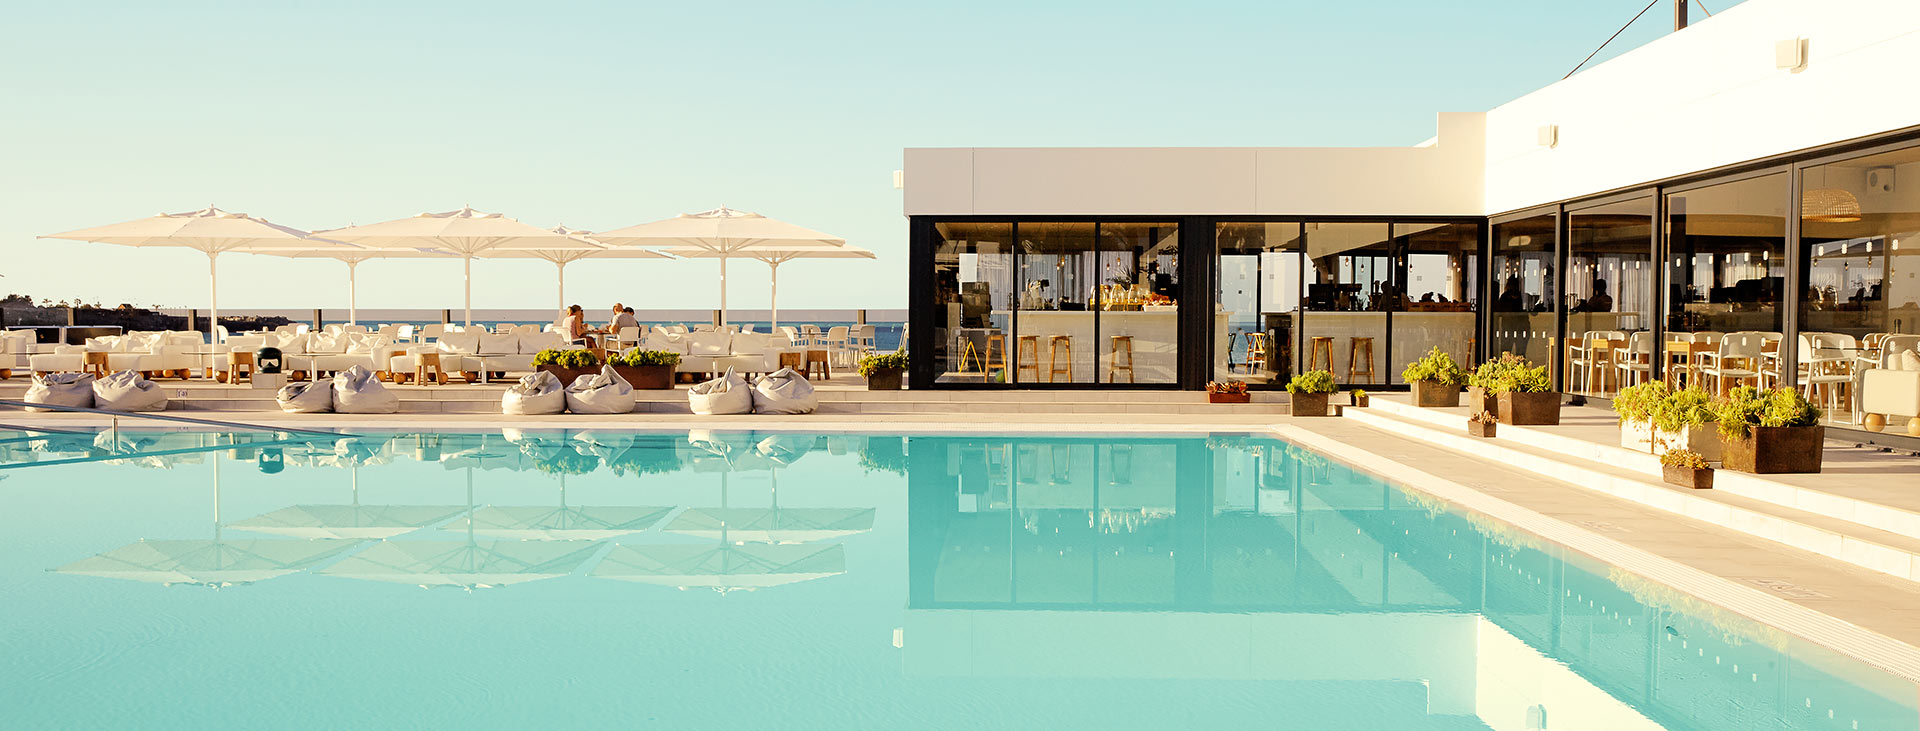 Ocean Beach Club - Gran Canaria, Playa del Cura, Gran Canaria, Kanariansaaret